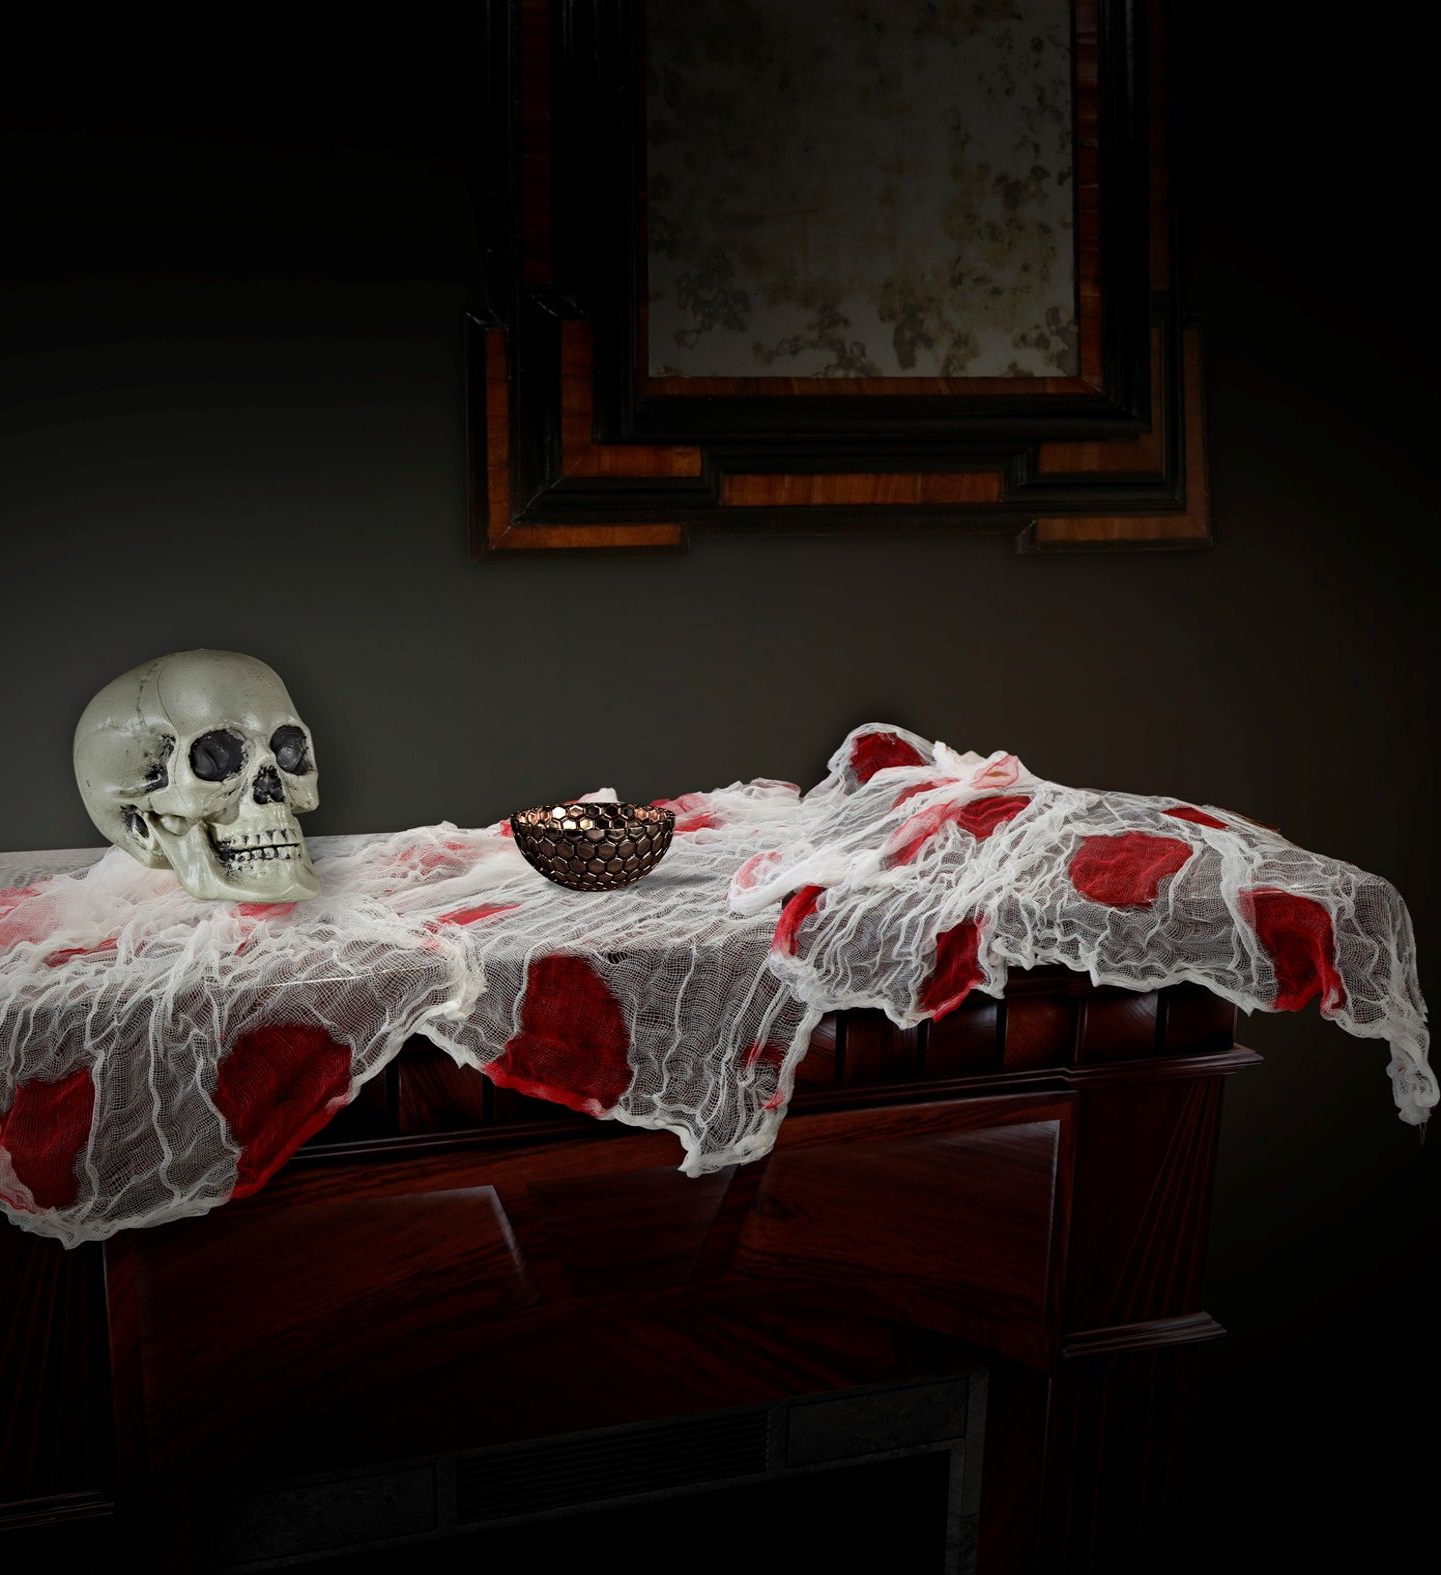 Bebloed tafelkleed